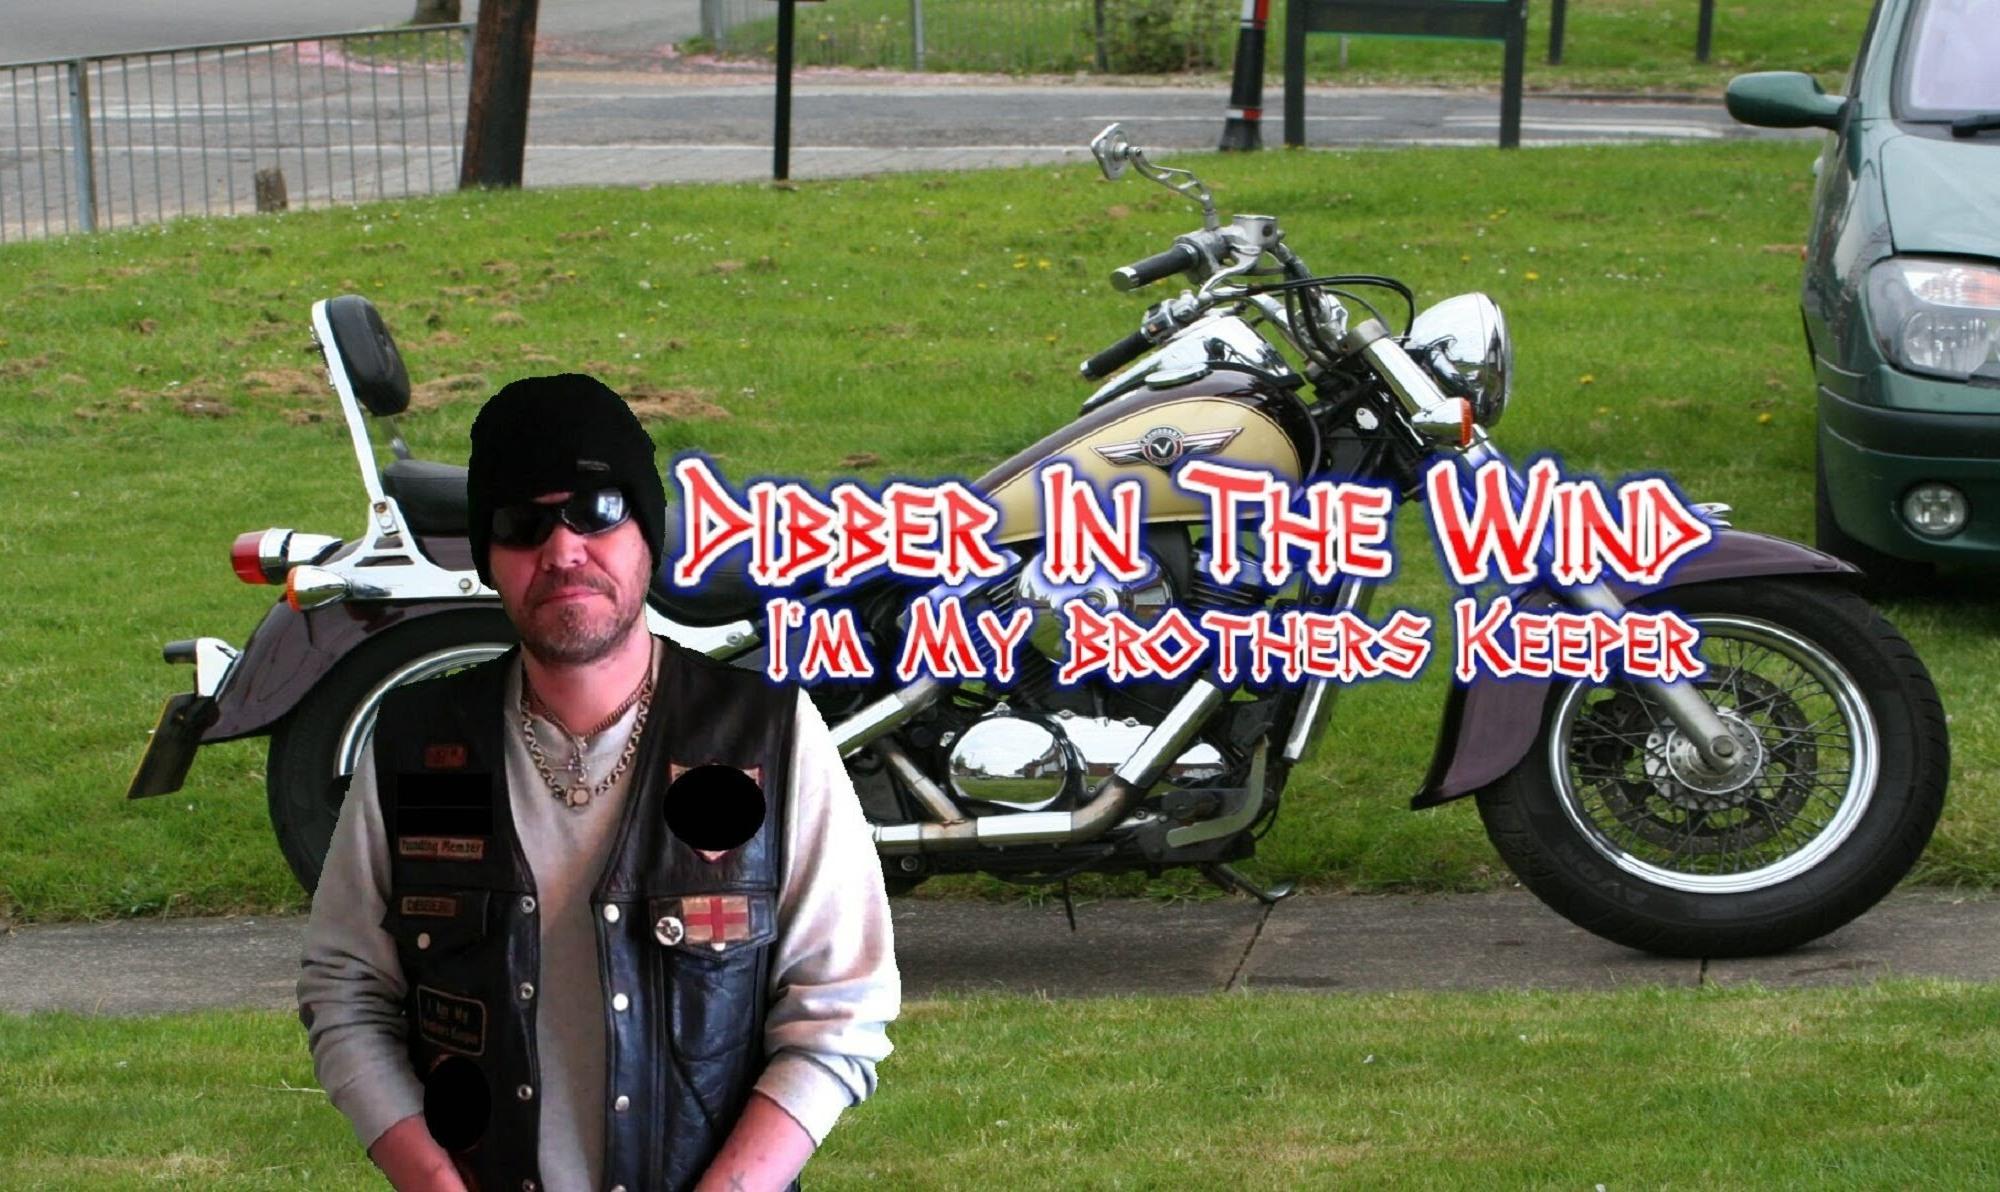 Dibber in the wind on youtube insane throttle biker news/ motorcycle news